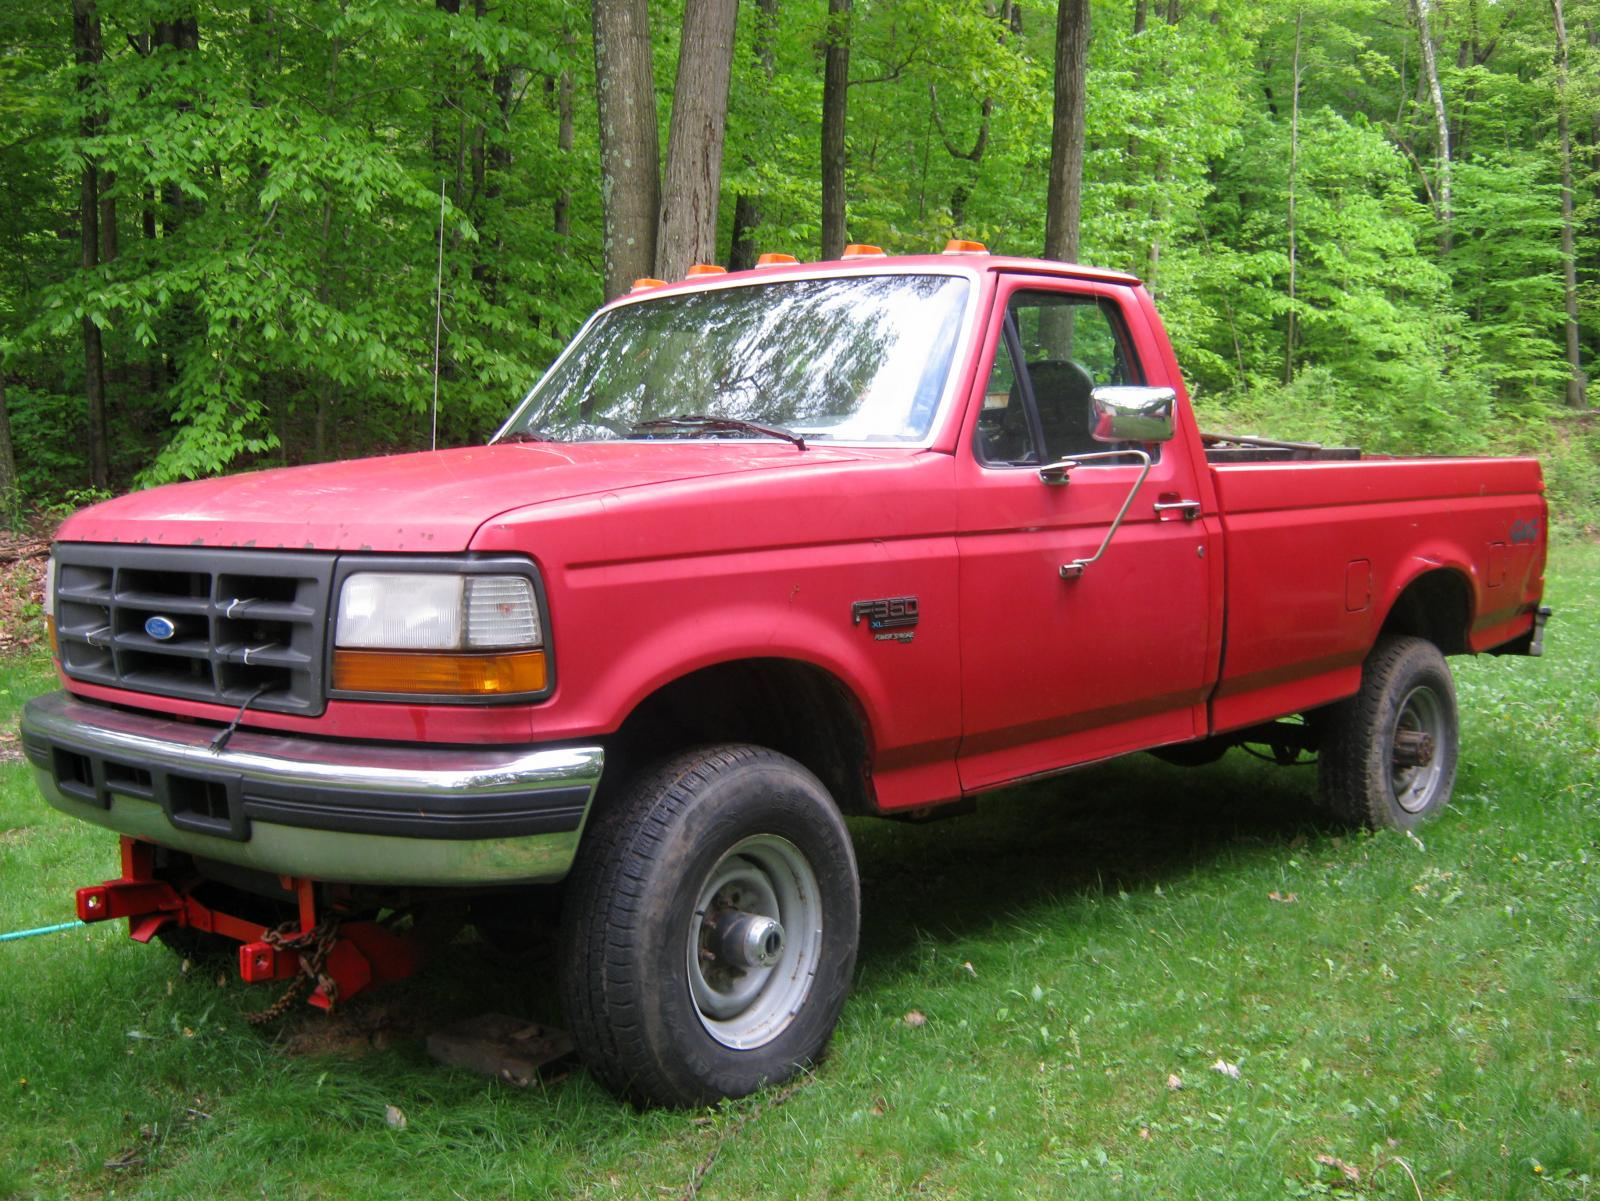 1992 1997 ford f series trucks other truck makes. Black Bedroom Furniture Sets. Home Design Ideas